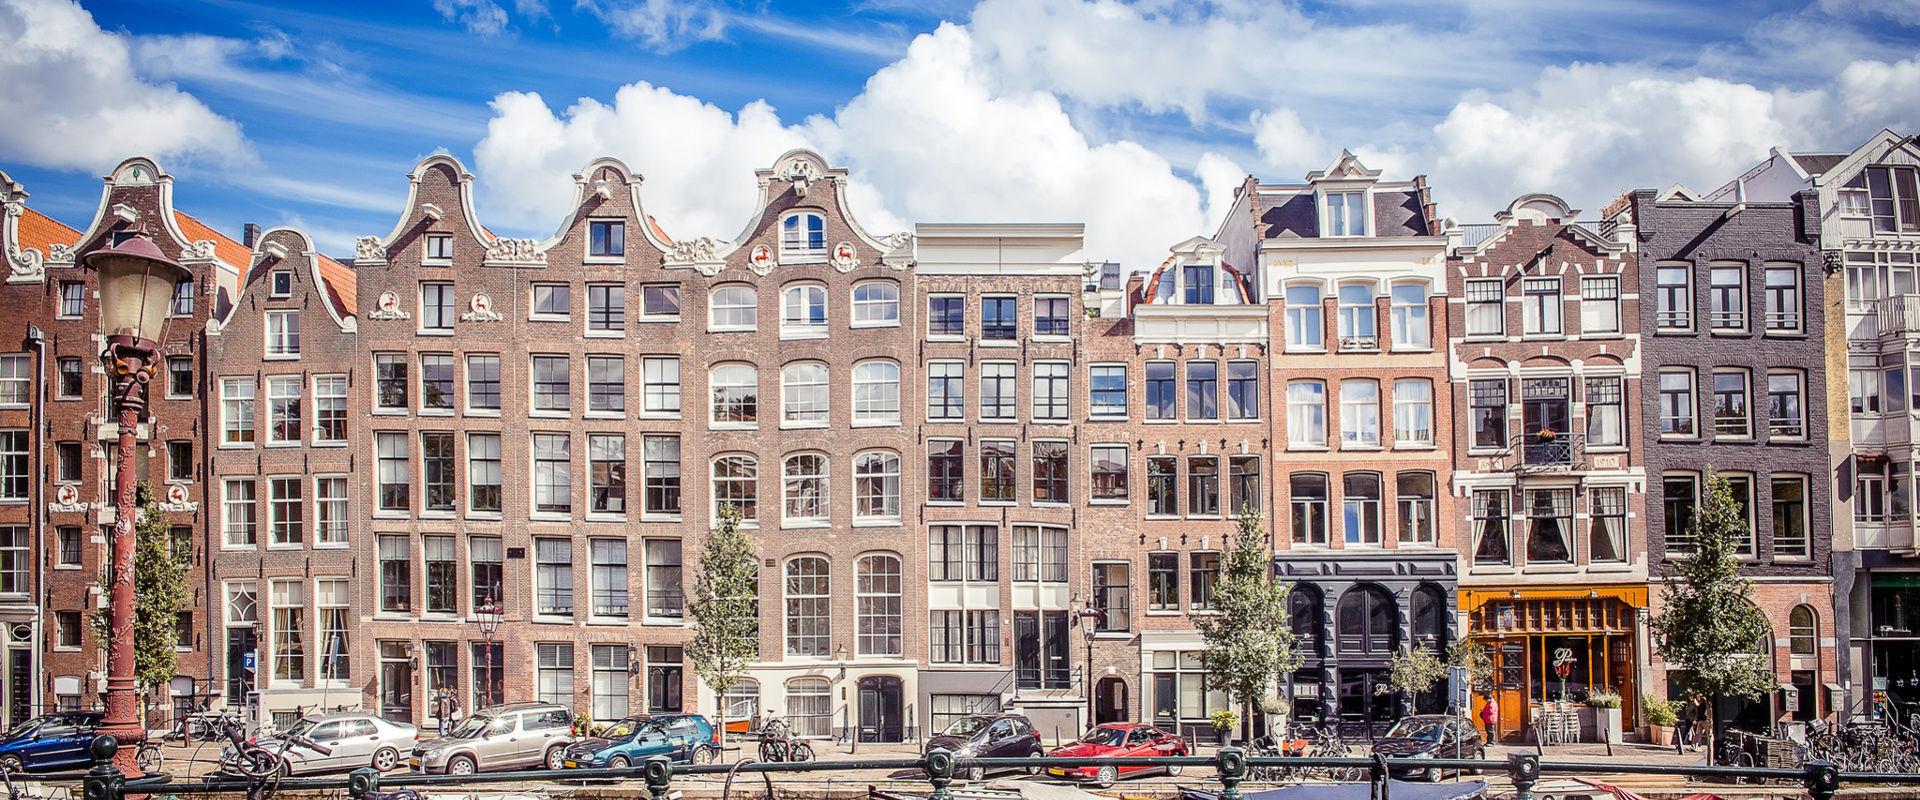 wide_fullhd_netherlands-amsterdam-1.jpg